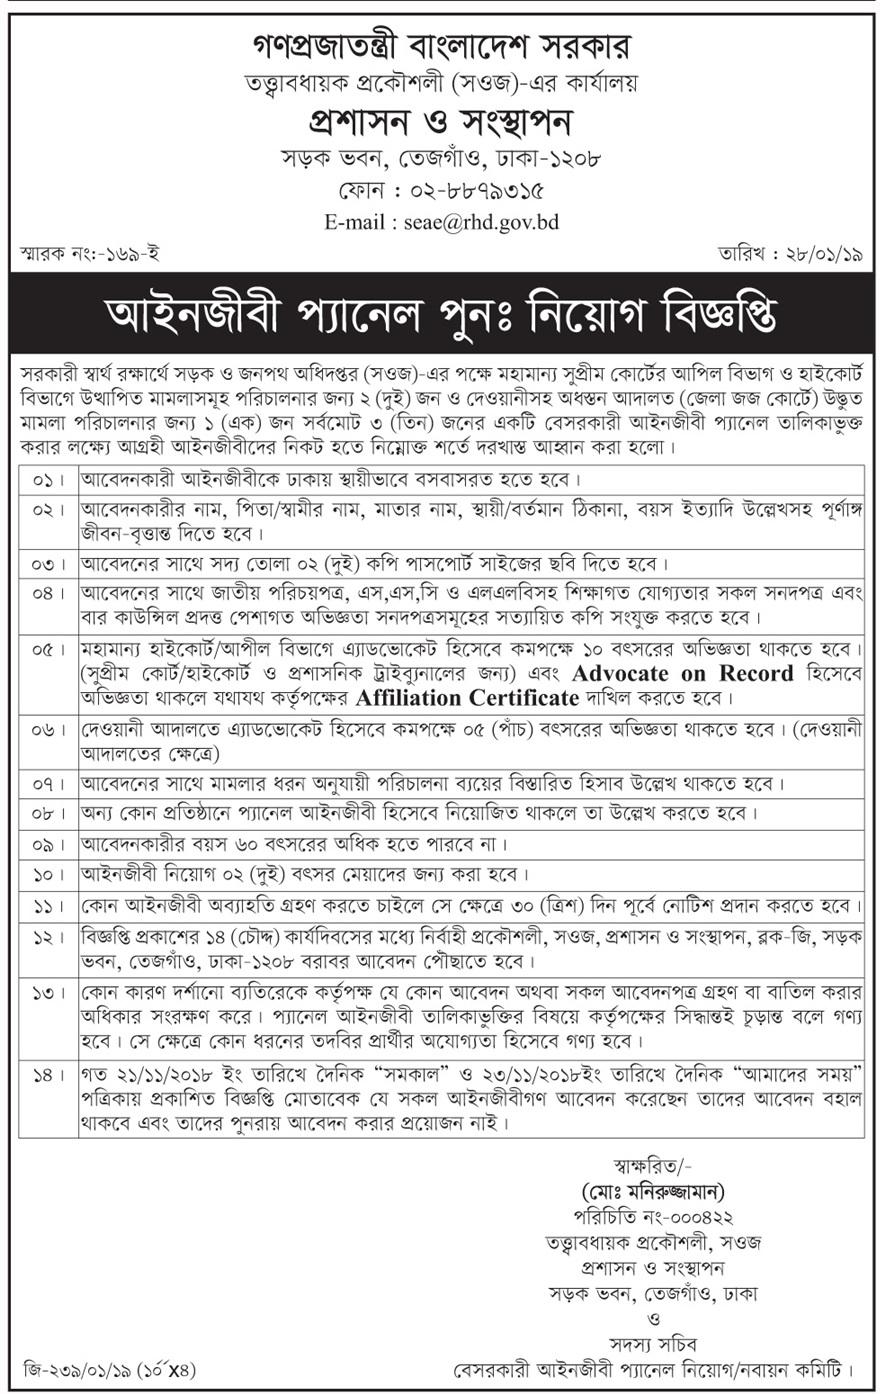 Roads And Highways Department Job Circular 2019